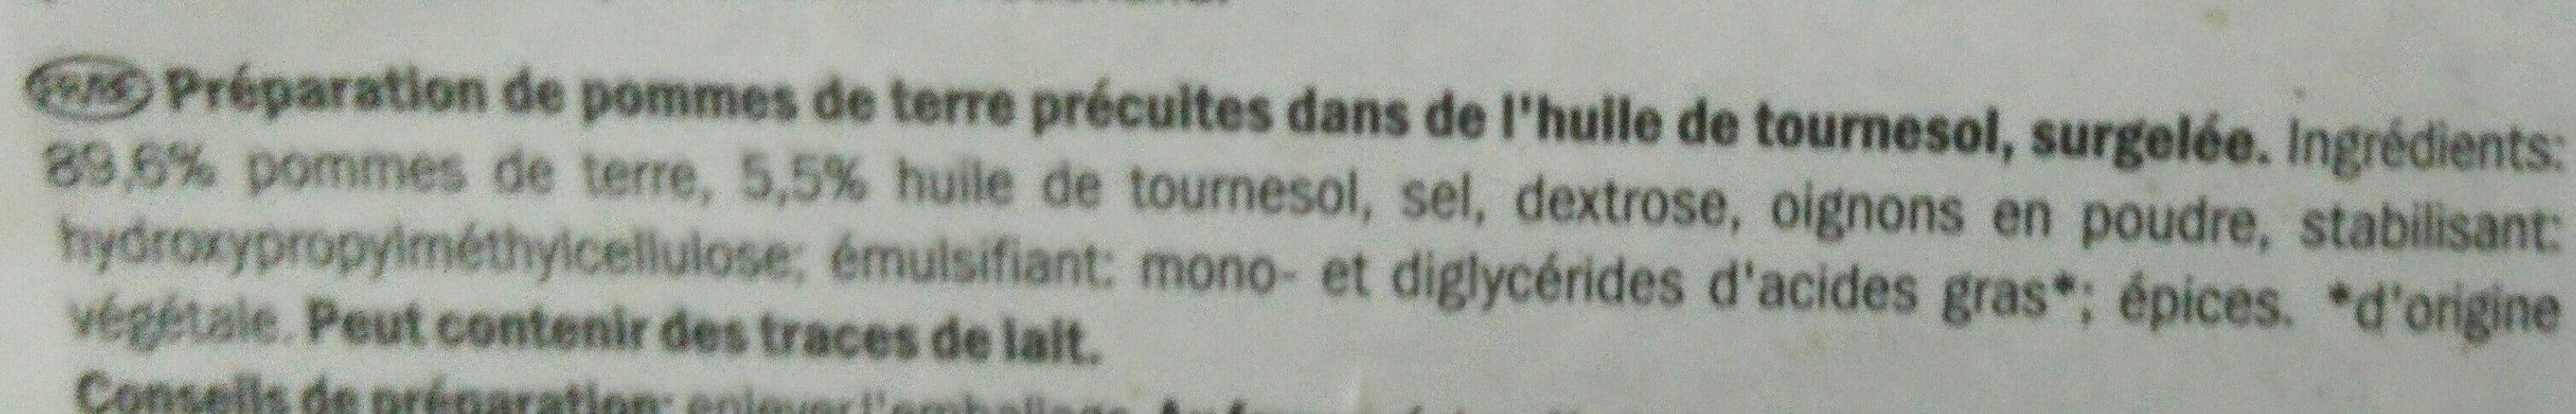 Duchess Potatoes - Ingredients - fr